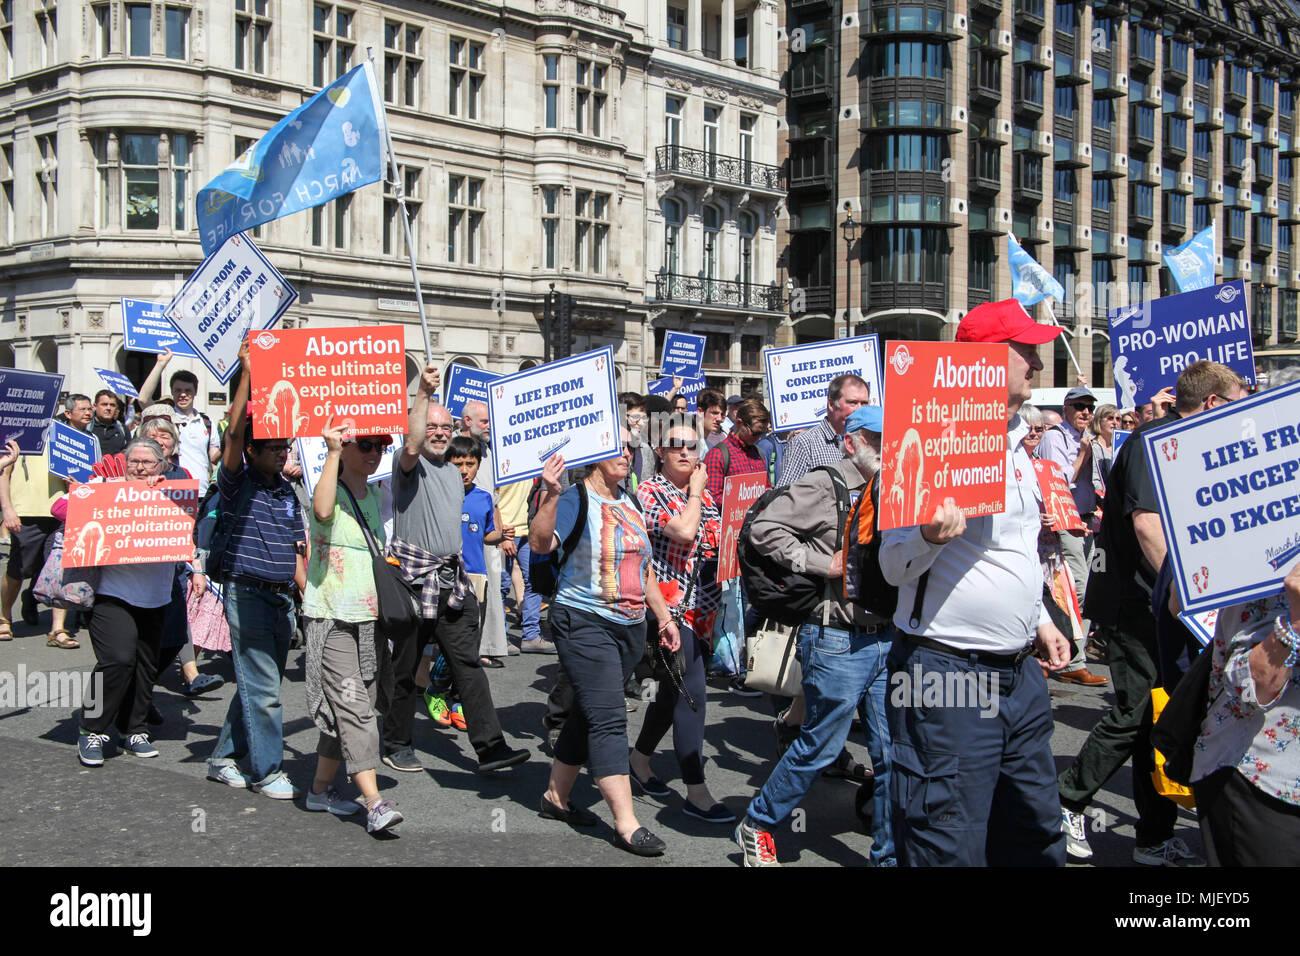 Londres, Reino Unido. 5 de mayo, 2018. Los manifestantes pro-vida de marzo a través de Londres Crédito: Alex Cavendish/Alamy Live News Foto de stock